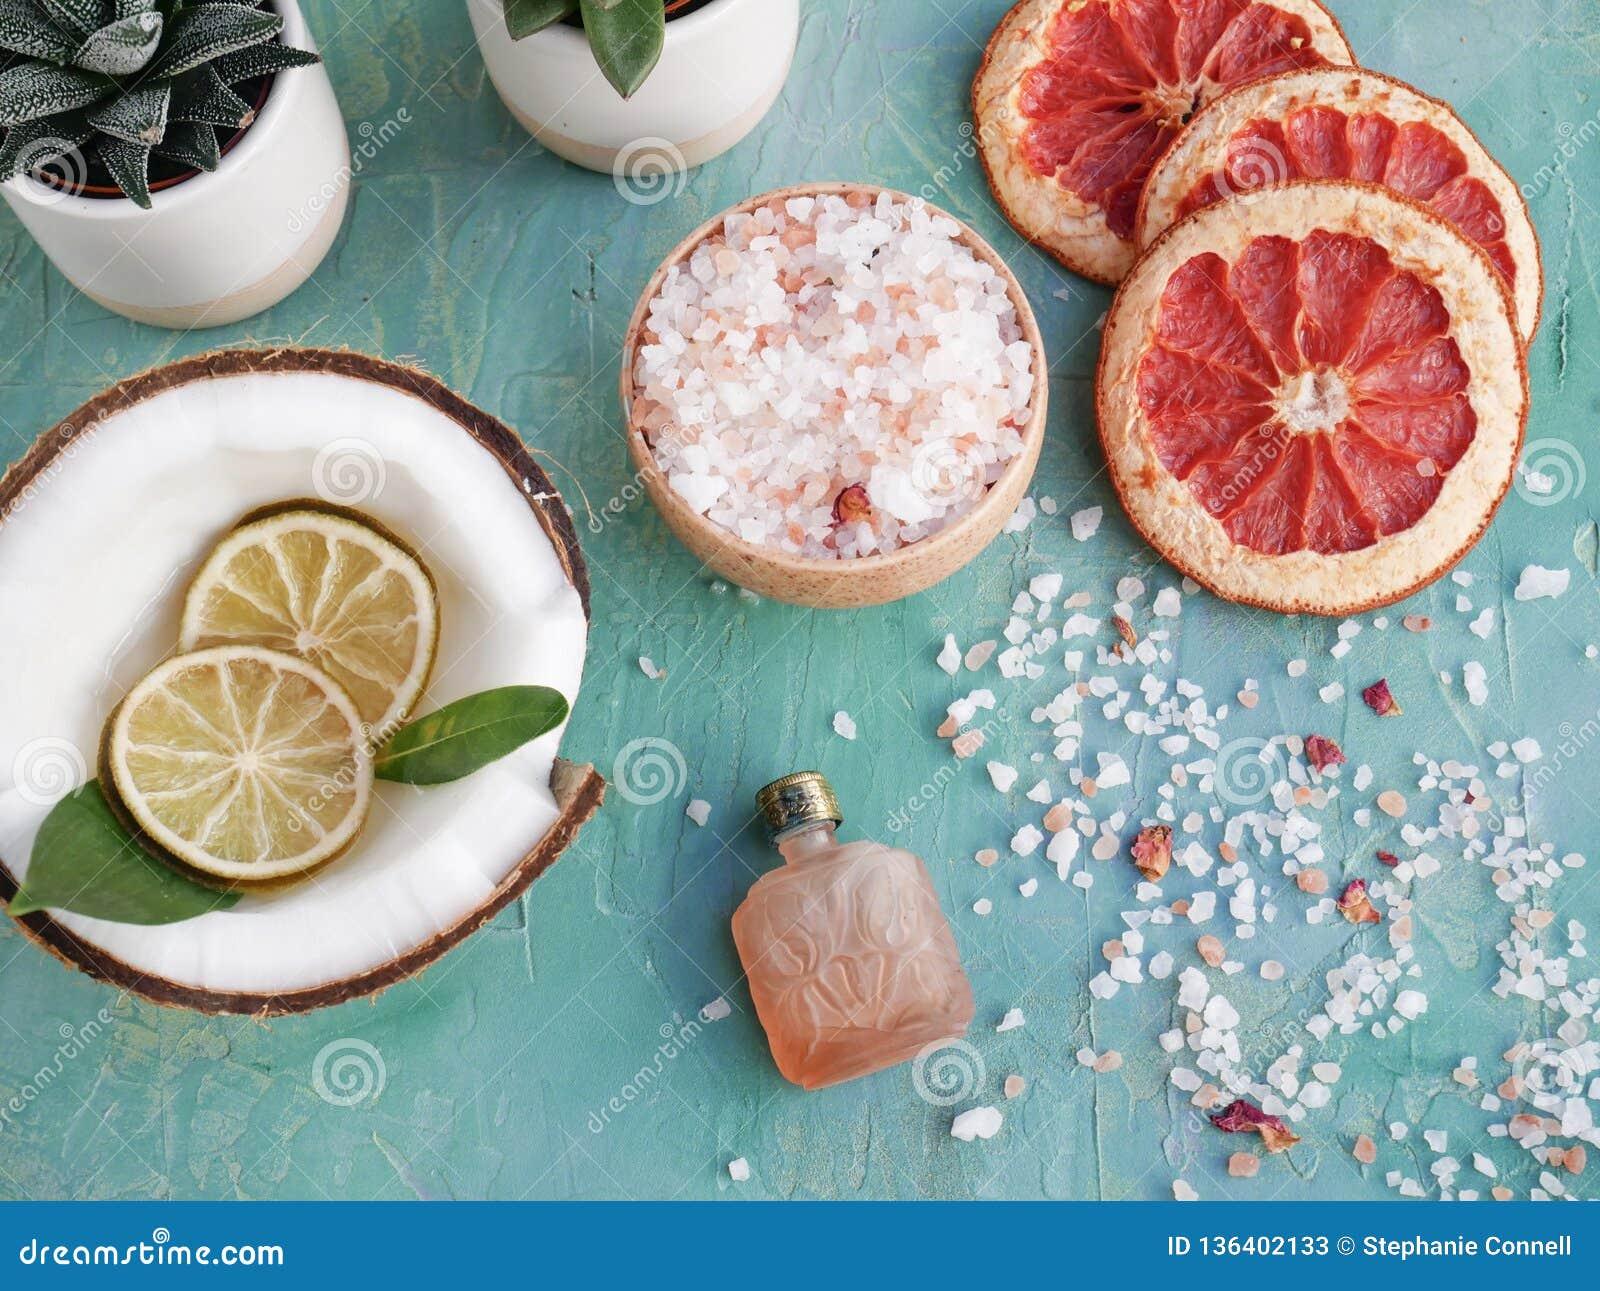 Essential oil and organic skincare